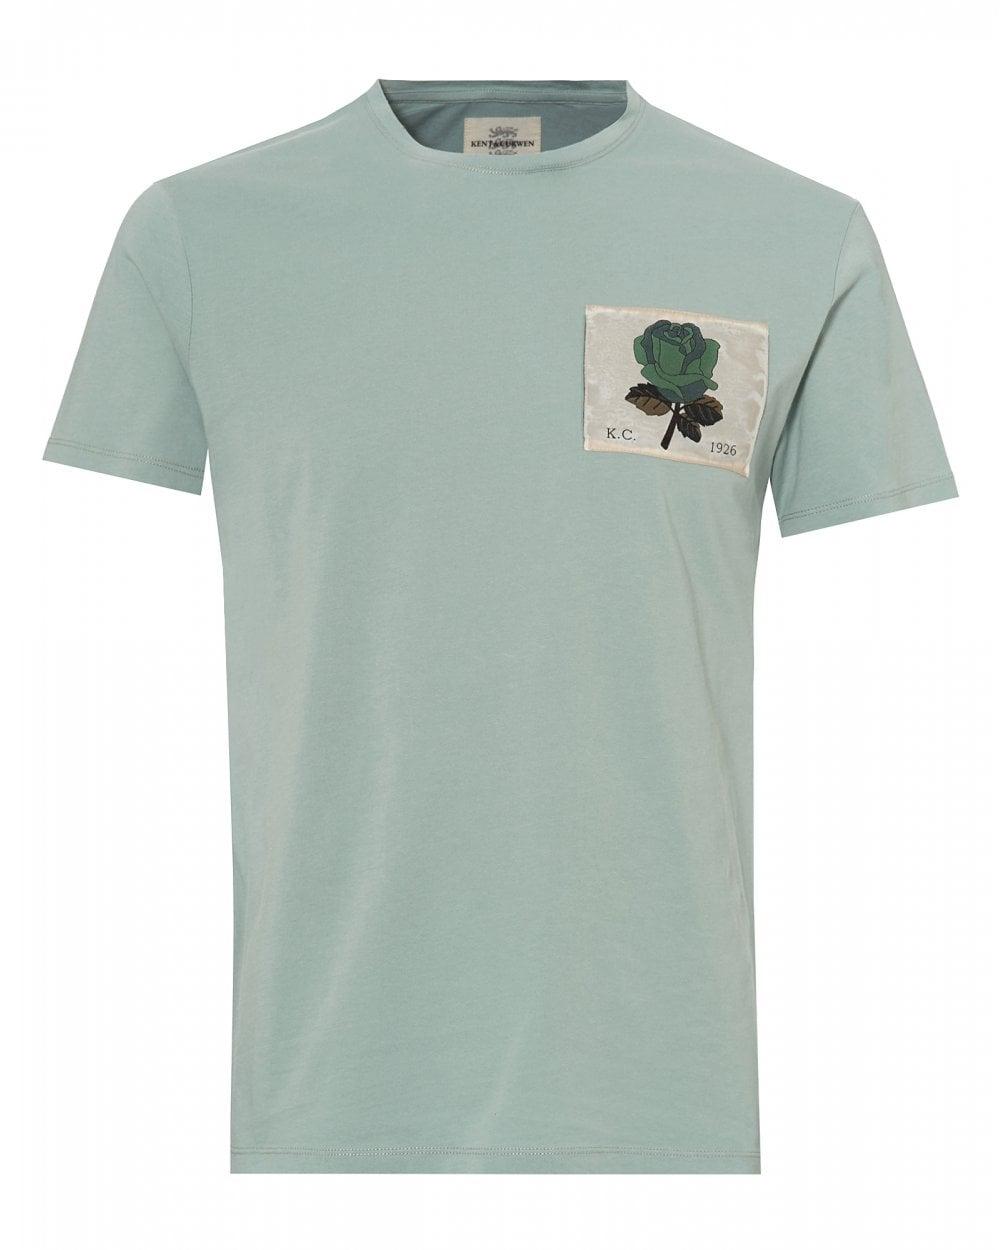 timeless design 65902 fb370 kent-curwen-mens-tonal-1926-rose-t-shirt-light-green-tee-p32999-146988 image.jpg